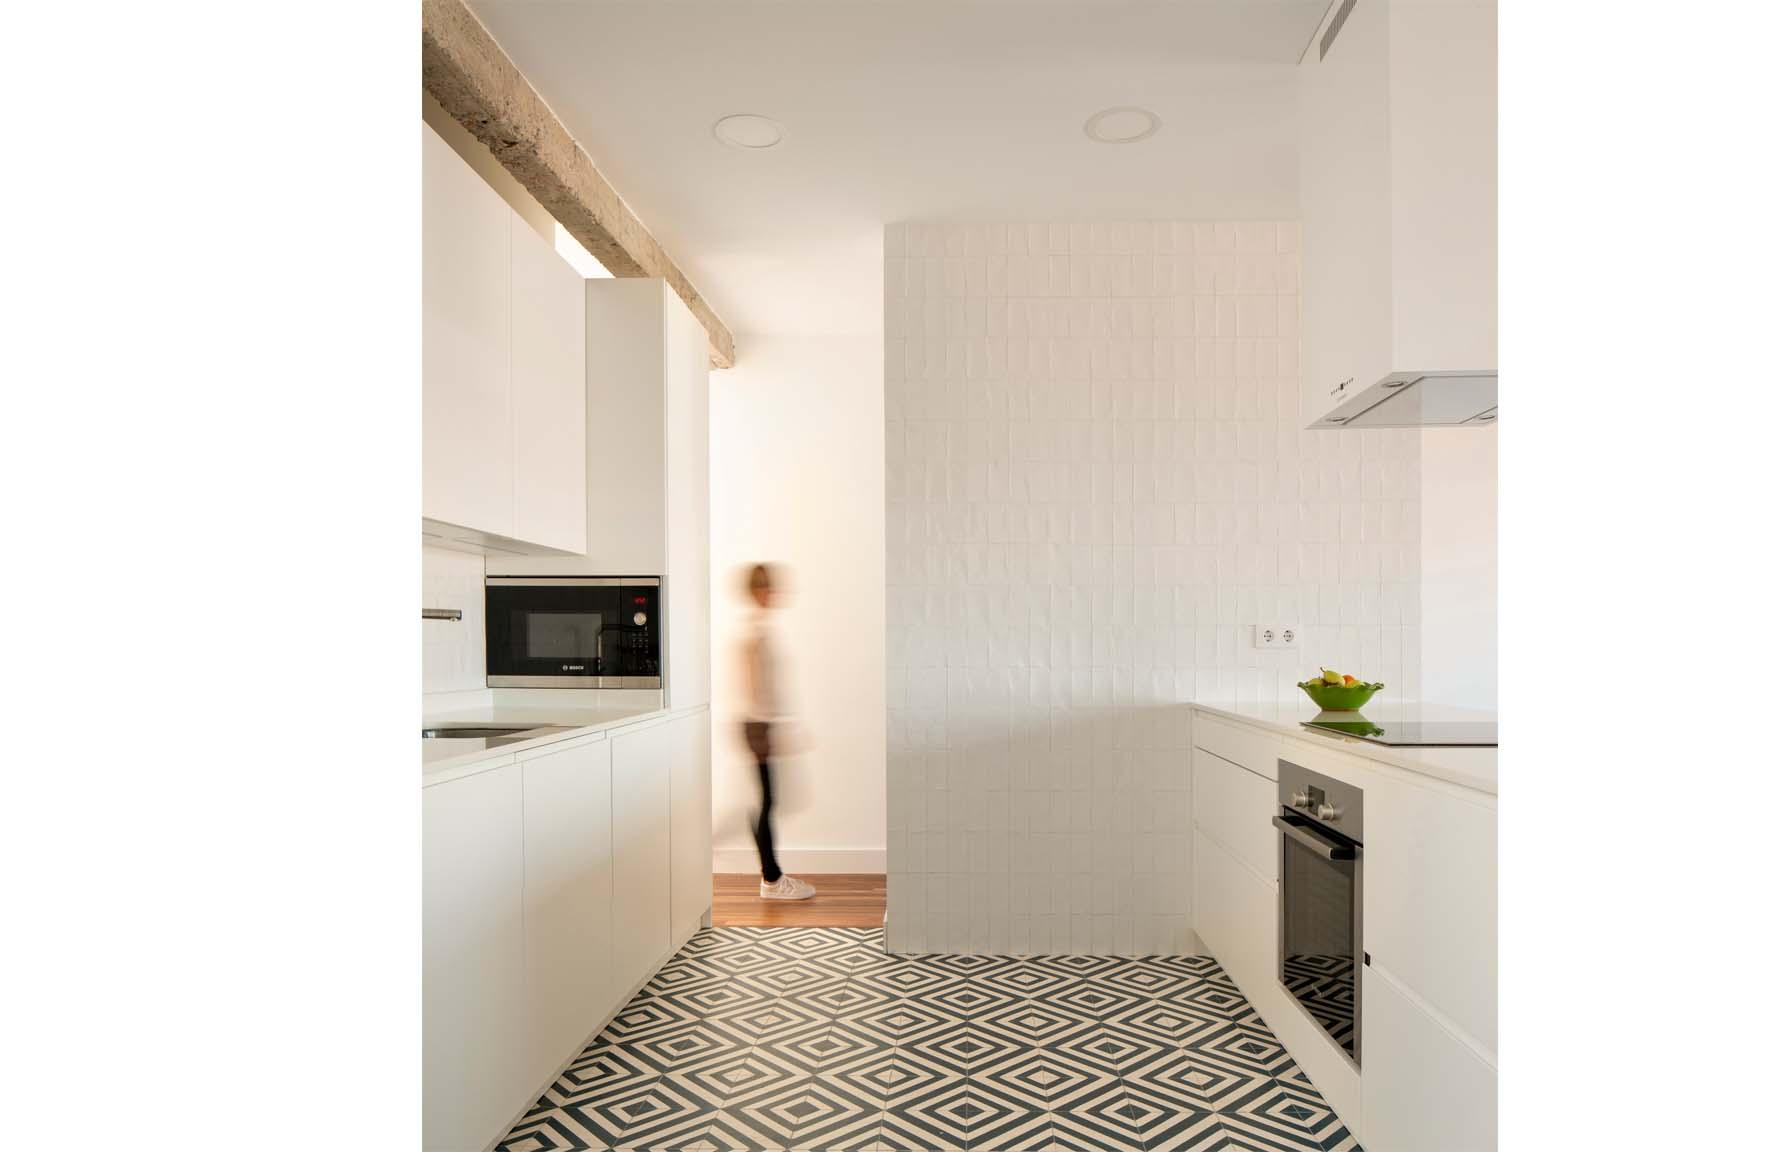 Apartment Areilza-Bilbao-Image 02.jpg